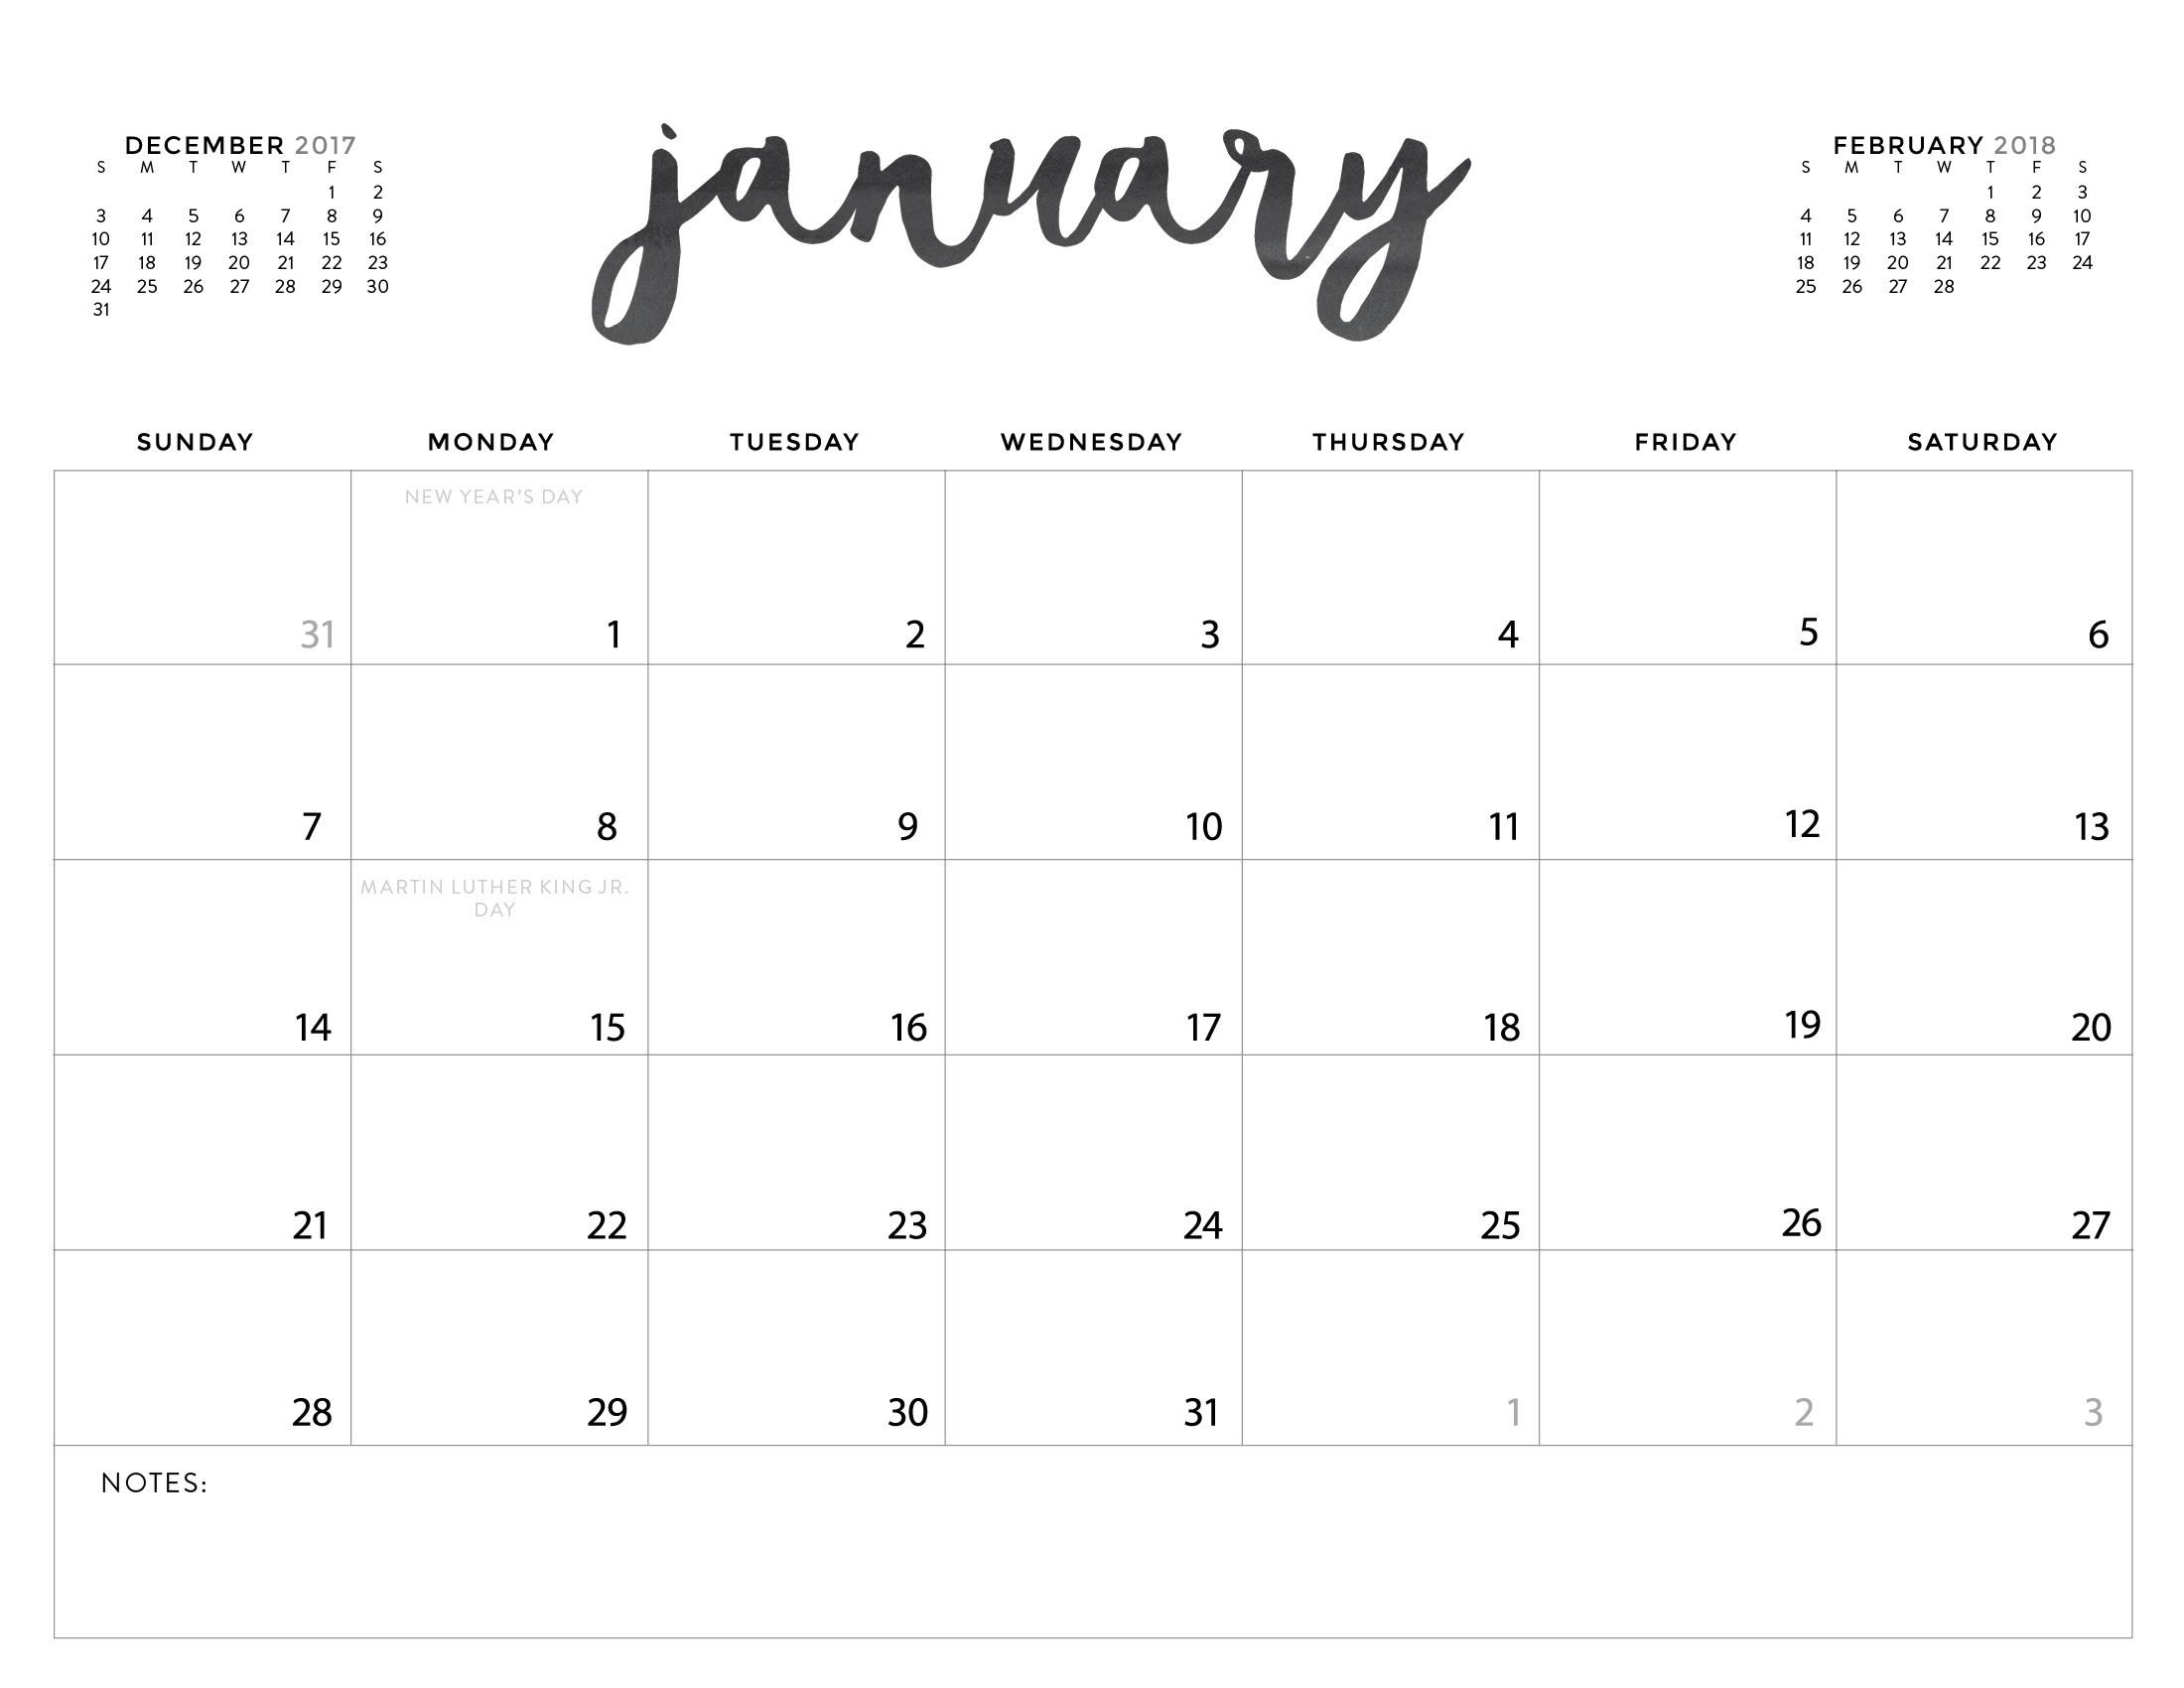 Printable Calendar 2019 Imom   Printable Calendar 2019 regarding 2020 Imom Free Calendars To Print